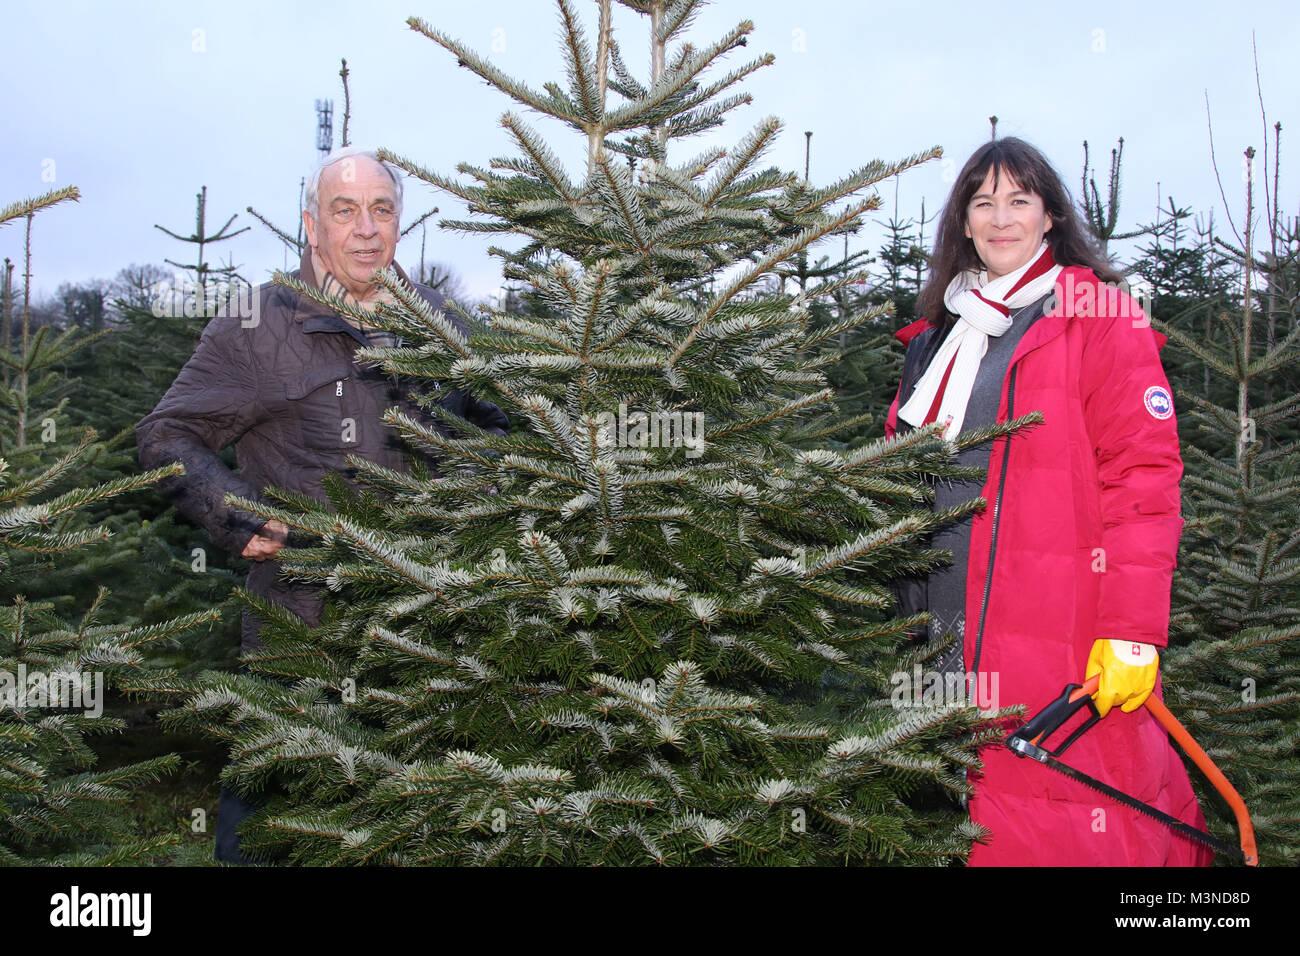 Sandra Maahn, Enno Glantz, Start des Tannenbaumselbstsaegens auf dem Erdbeerhof Glantz,Hamburg Delingsdorf, 11.12.2016 - Stock Image